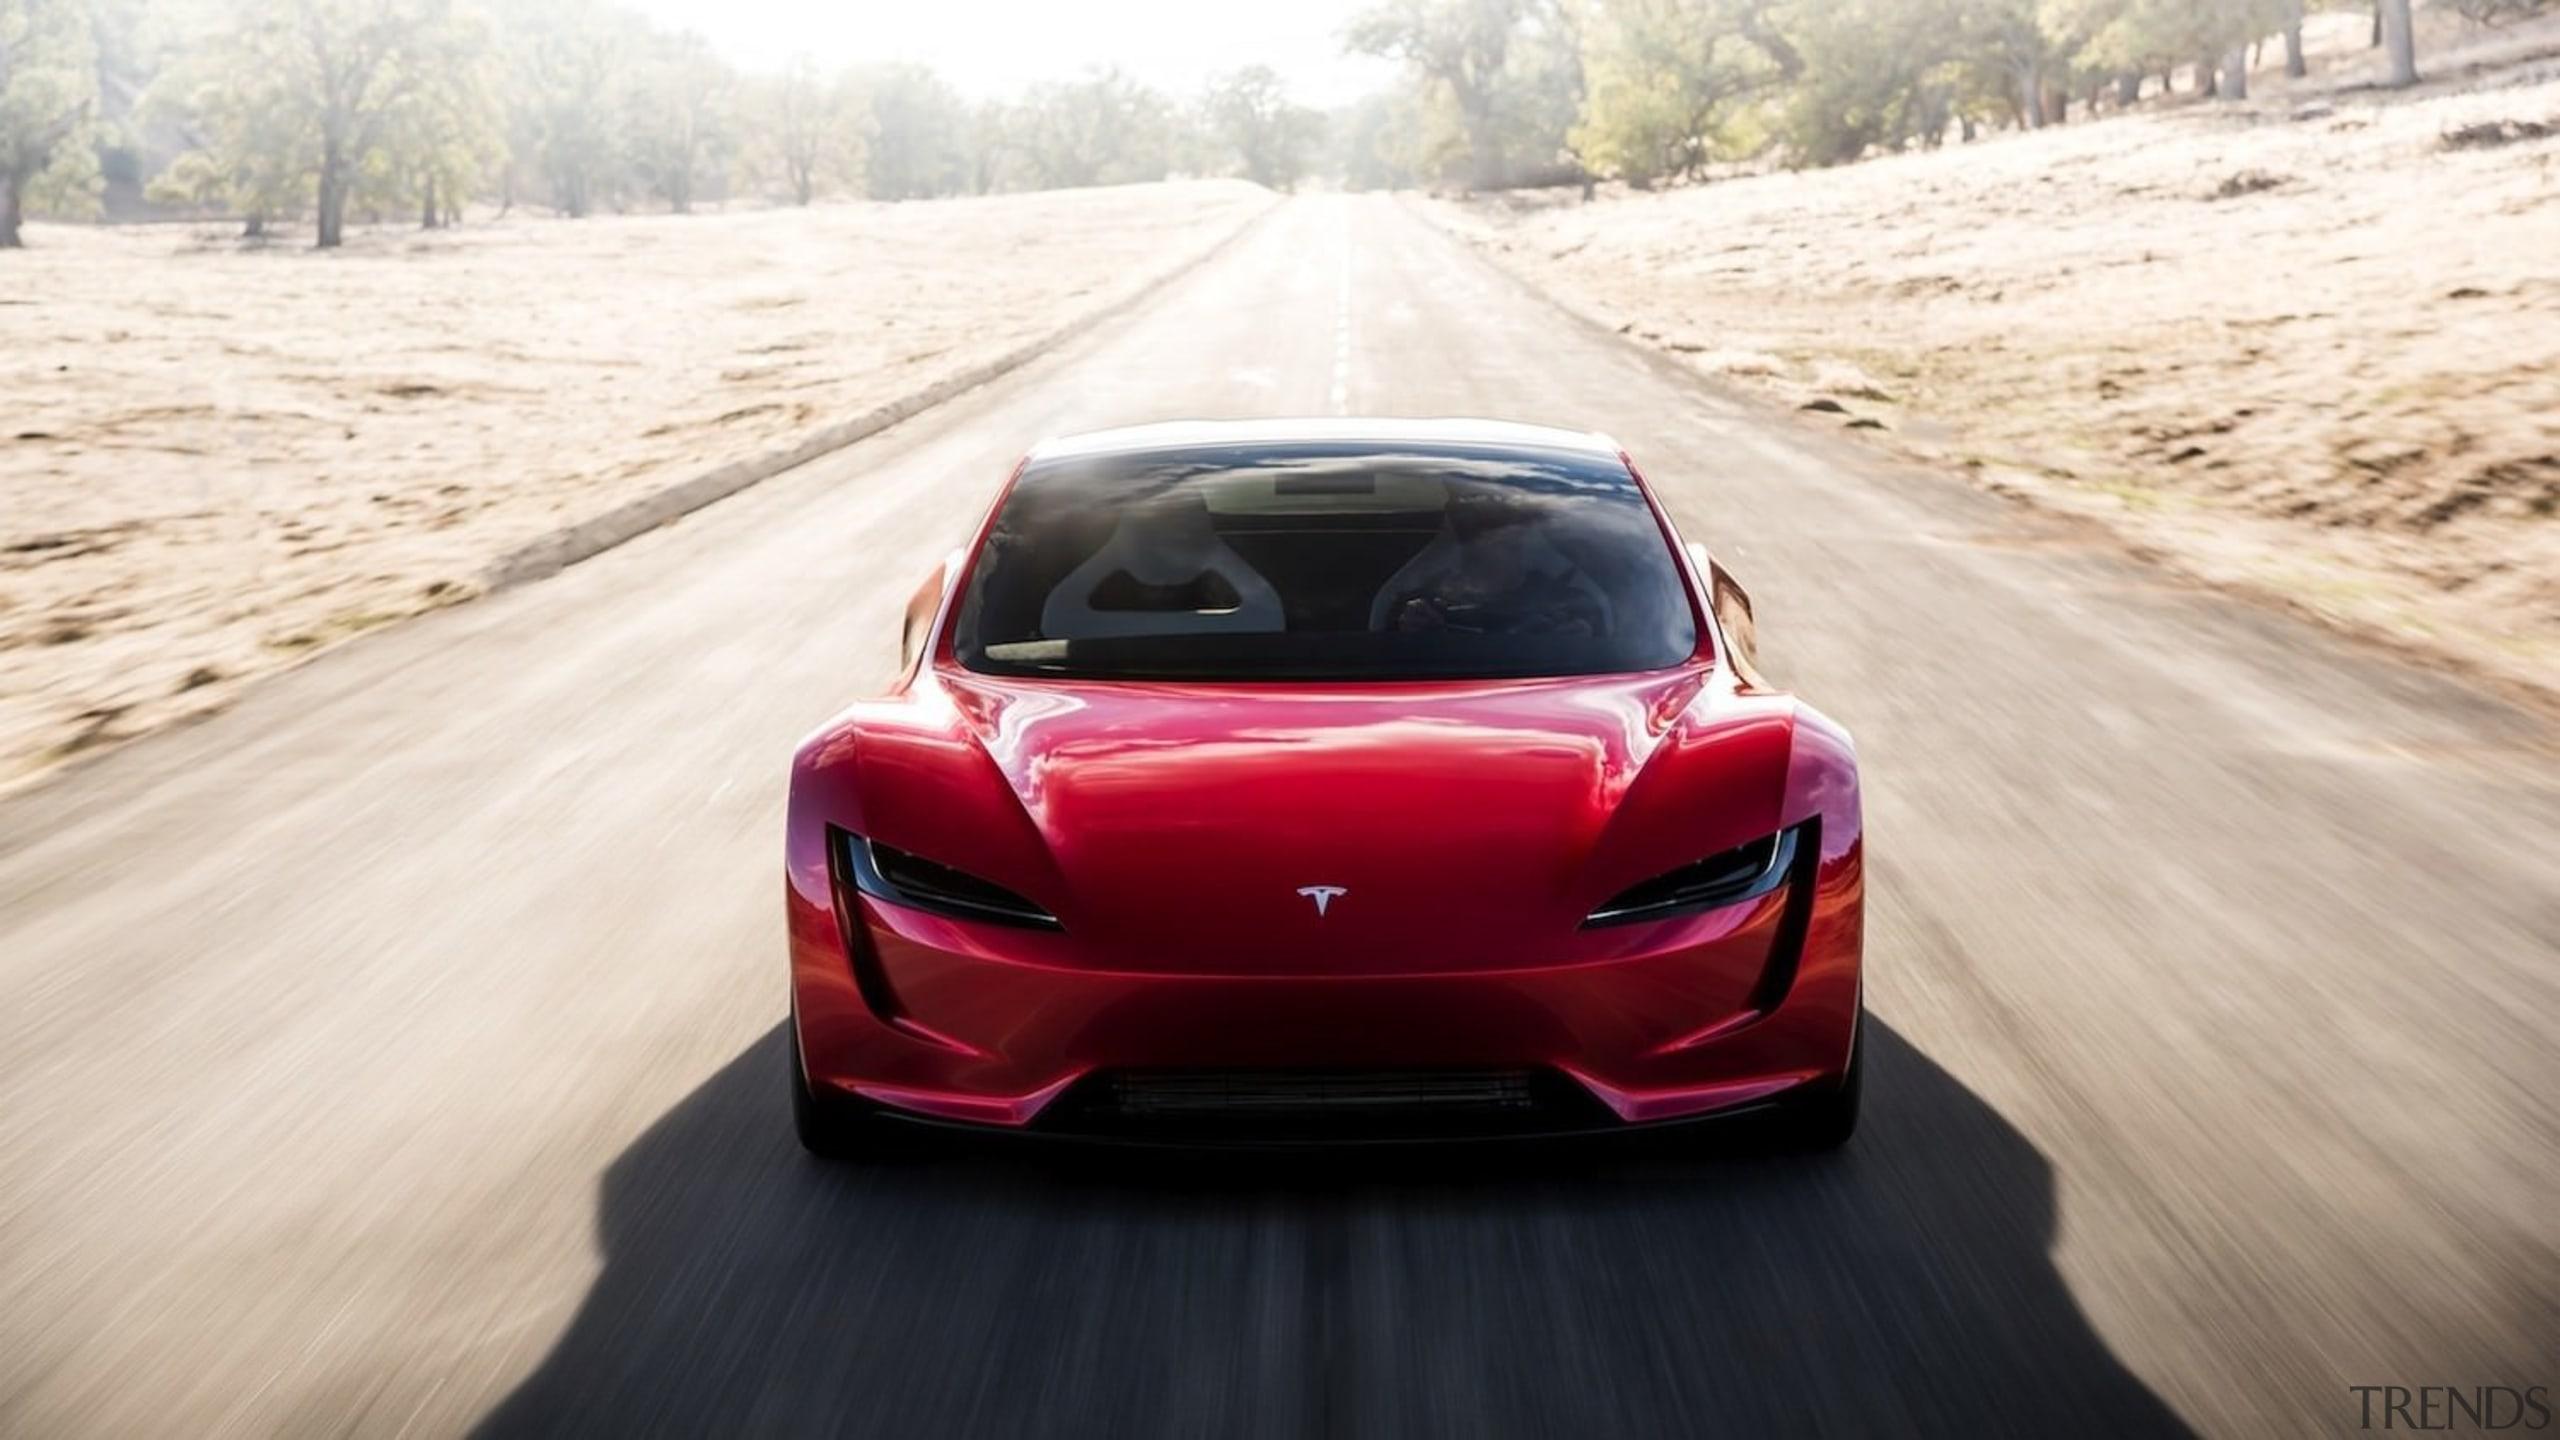 Tesla's new Roadster - Tesla's new Roadster - automotive design, automotive exterior, car, computer wallpaper, concept car, land vehicle, luxury vehicle, mid size car, motor vehicle, performance car, personal luxury car, race car, sports car, supercar, vehicle, white